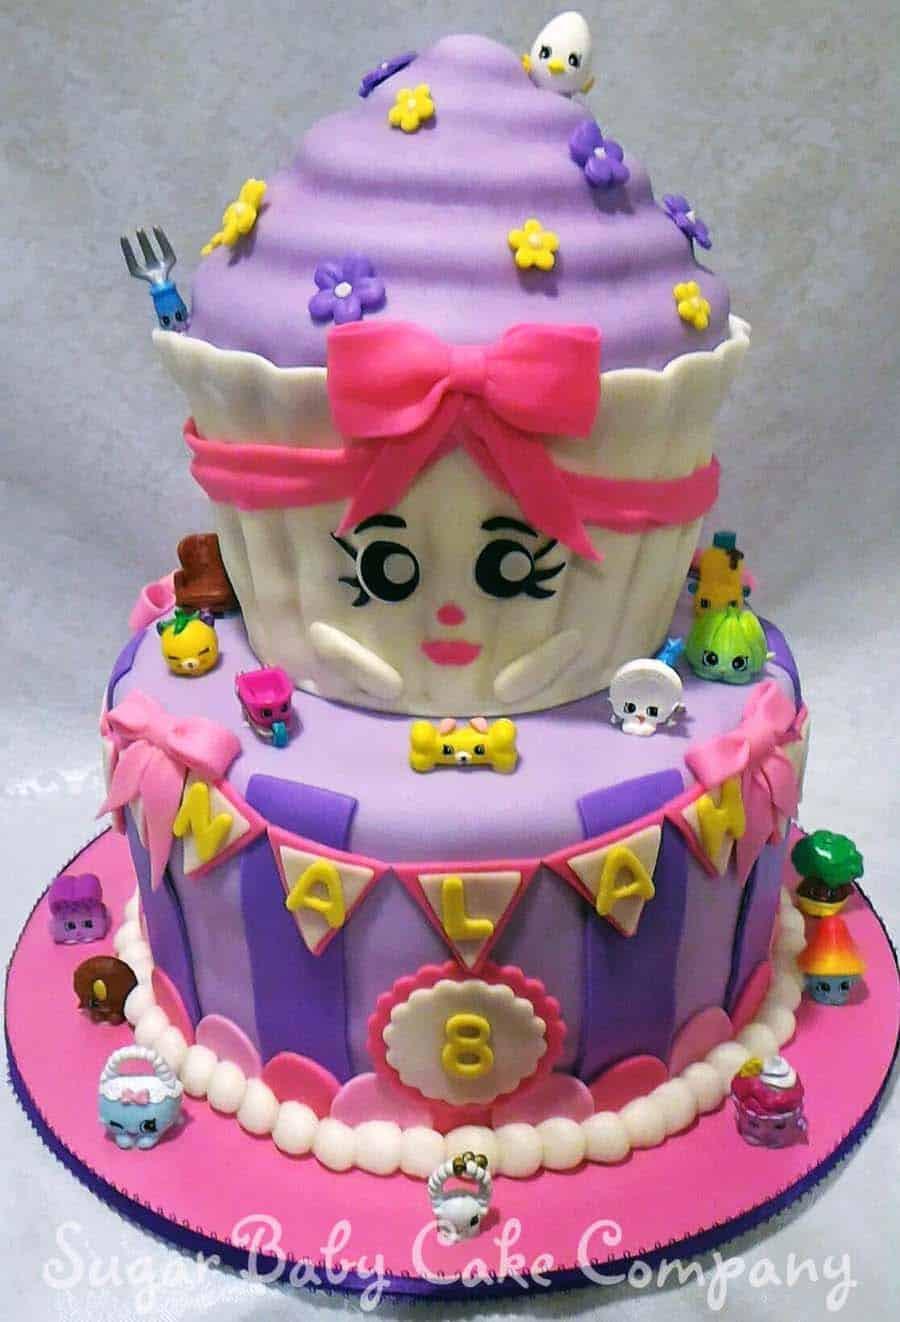 Kids Birthday Cake Recepies  24 Fun Themed Kids Birthday Cake Ideas Ideal Me